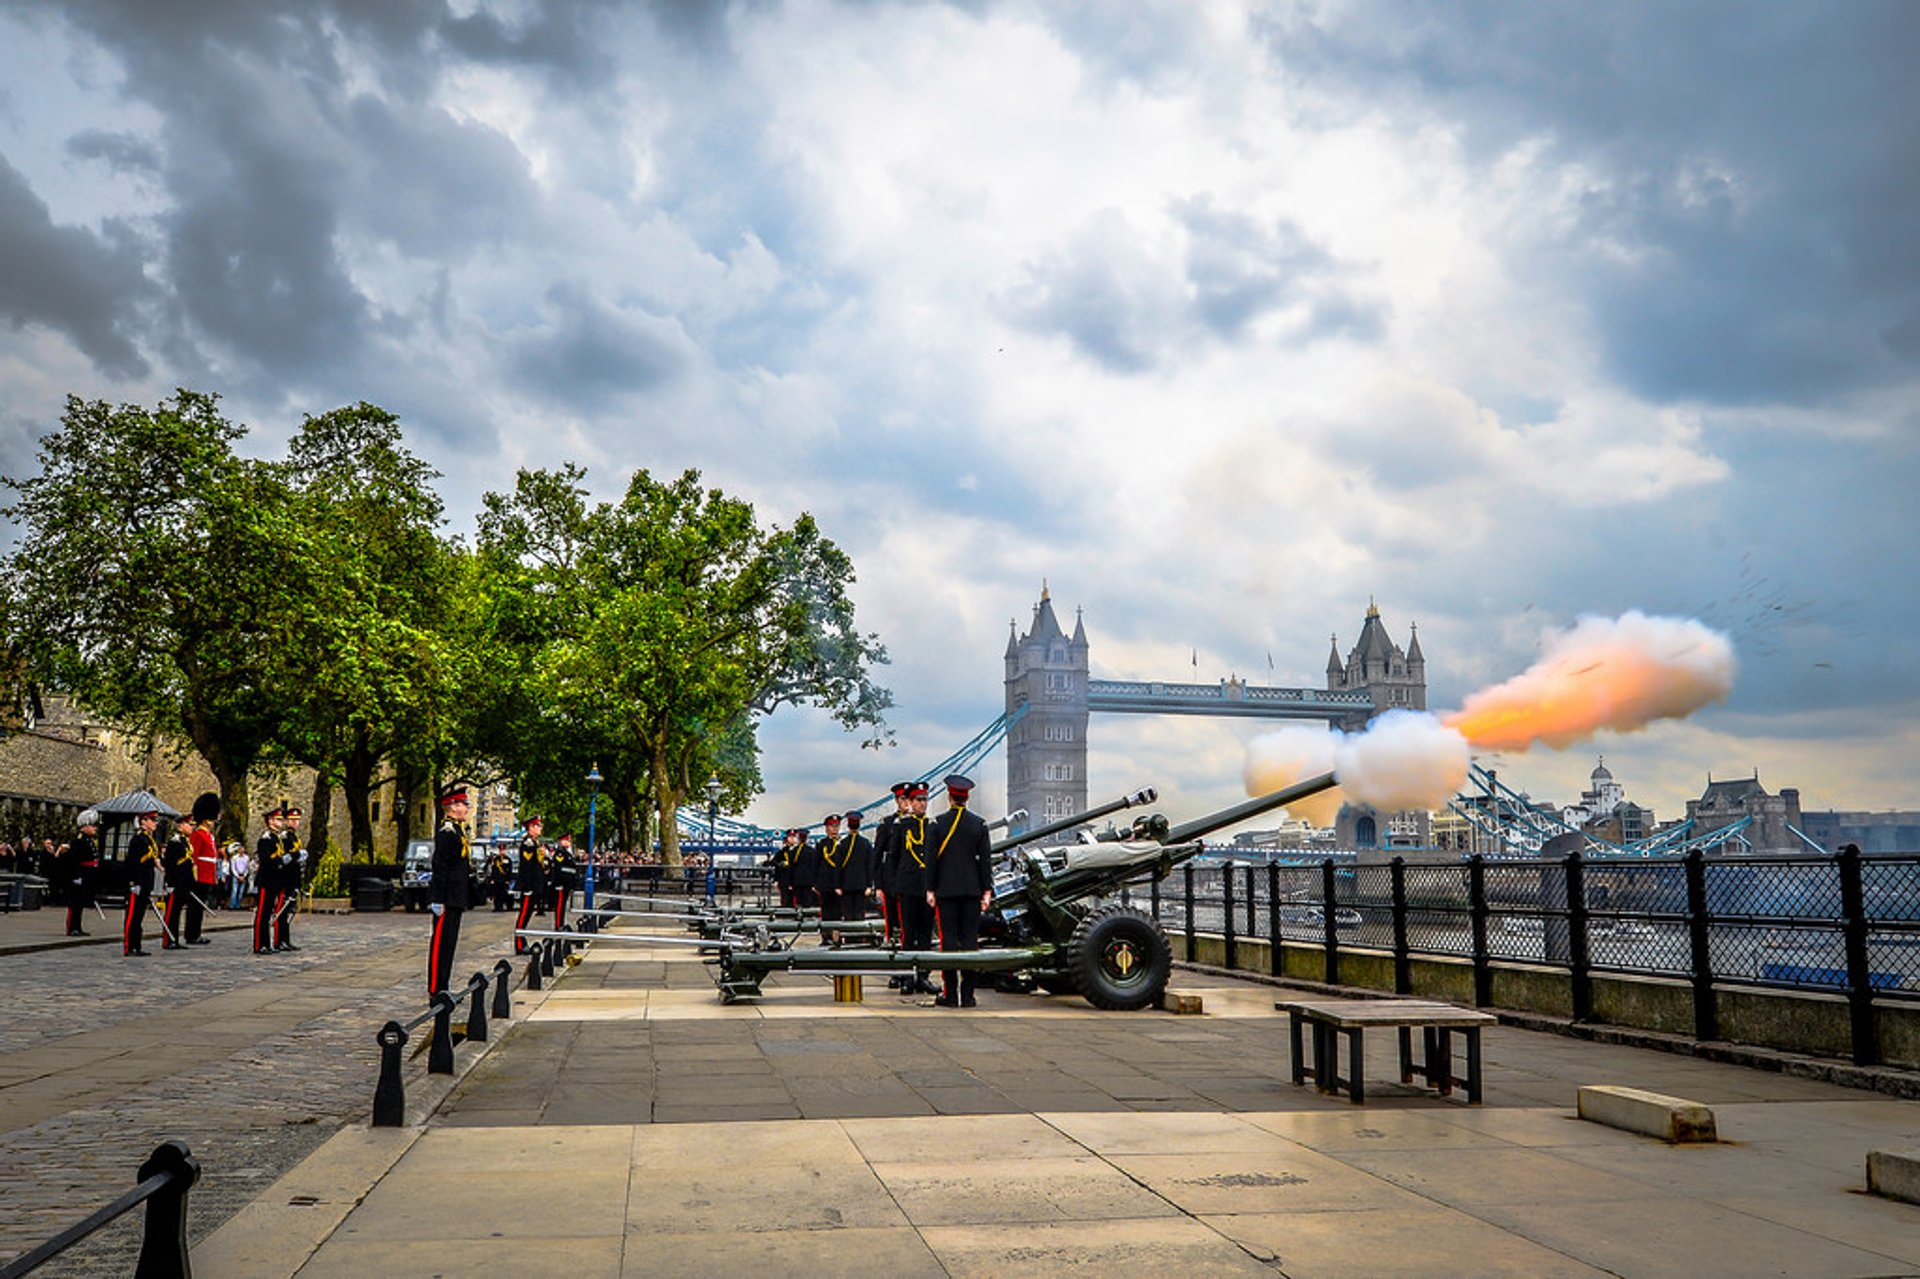 Royal Gun Salutes in London 2020 - Best Time